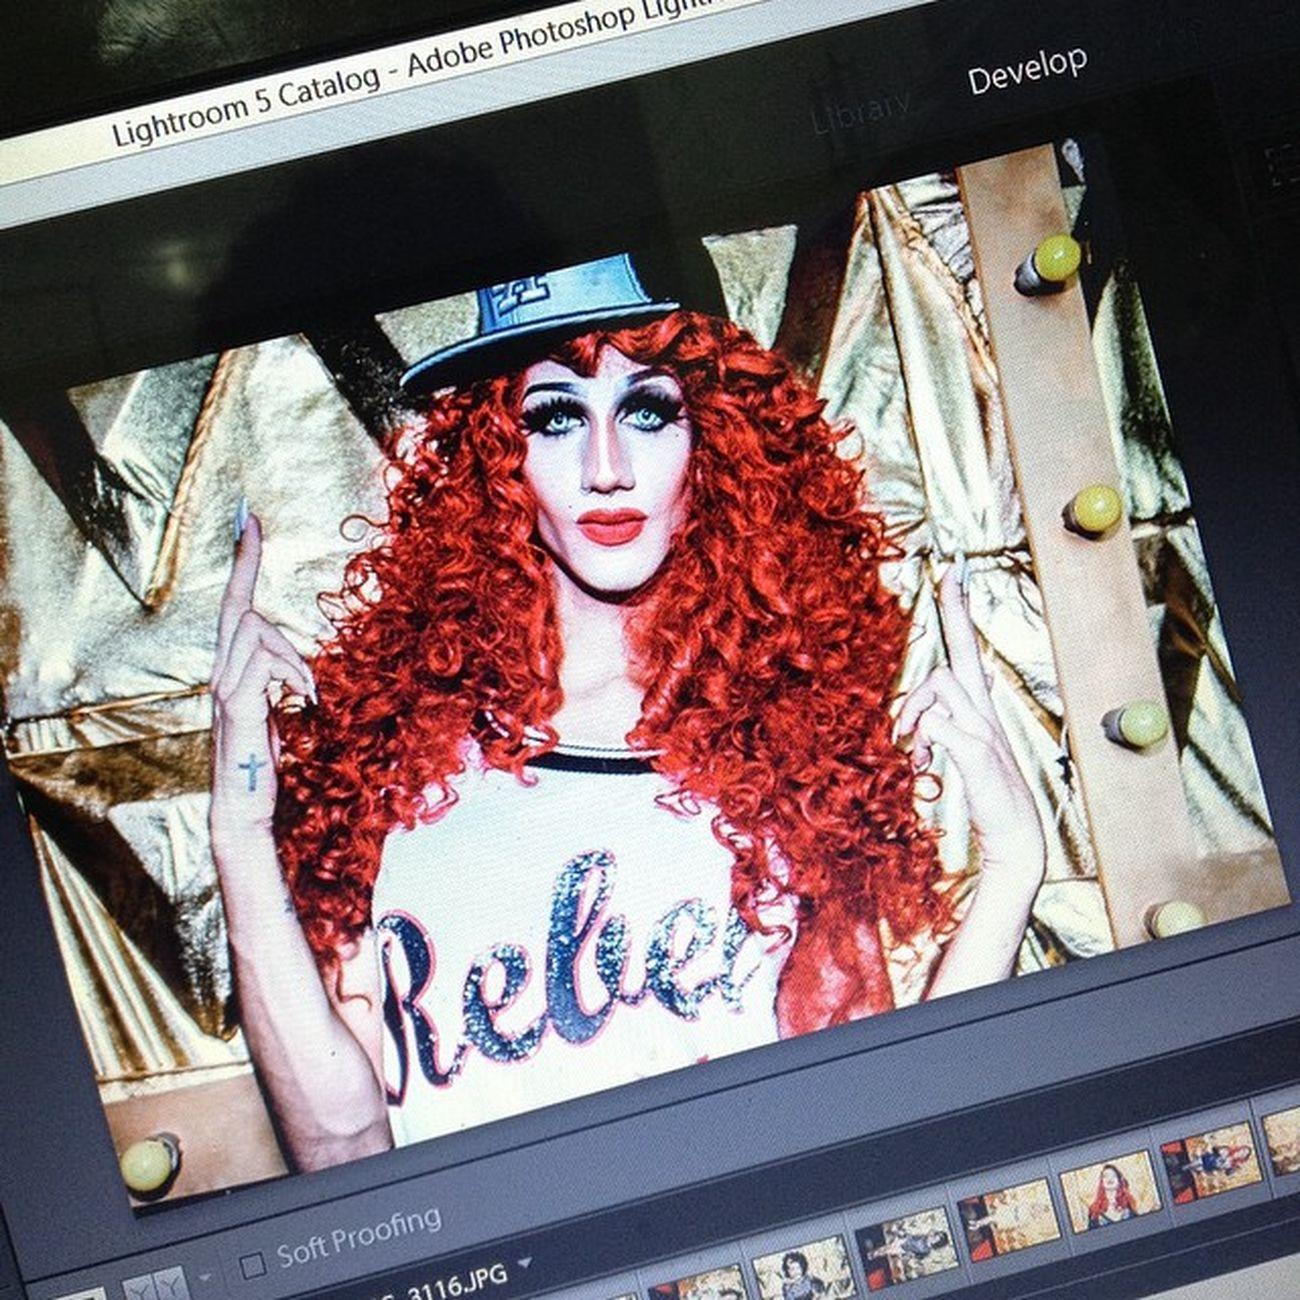 Edição rápida das fotos de sexta passada da @letsclubbrasilia na @victoriahausbrasilia! Na foto a bela @myers_carrie Pearlsnregras